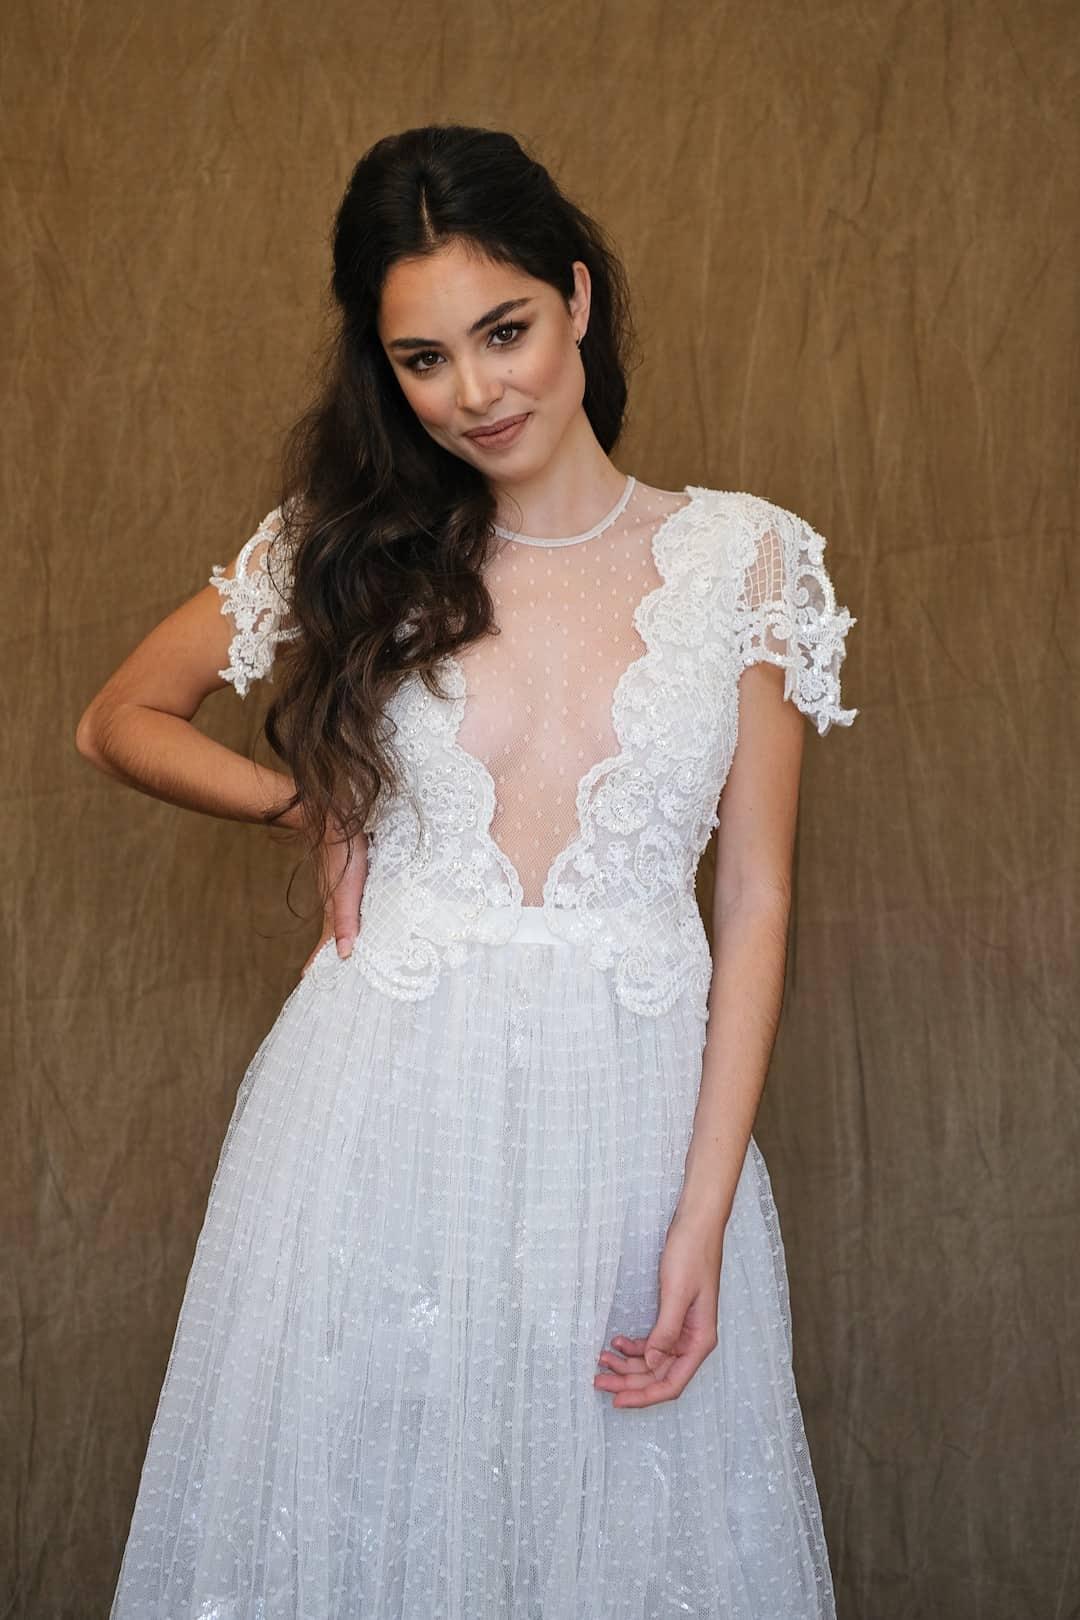 Romantic wedding dress - Marco&Maria - 2017-1007- front_top